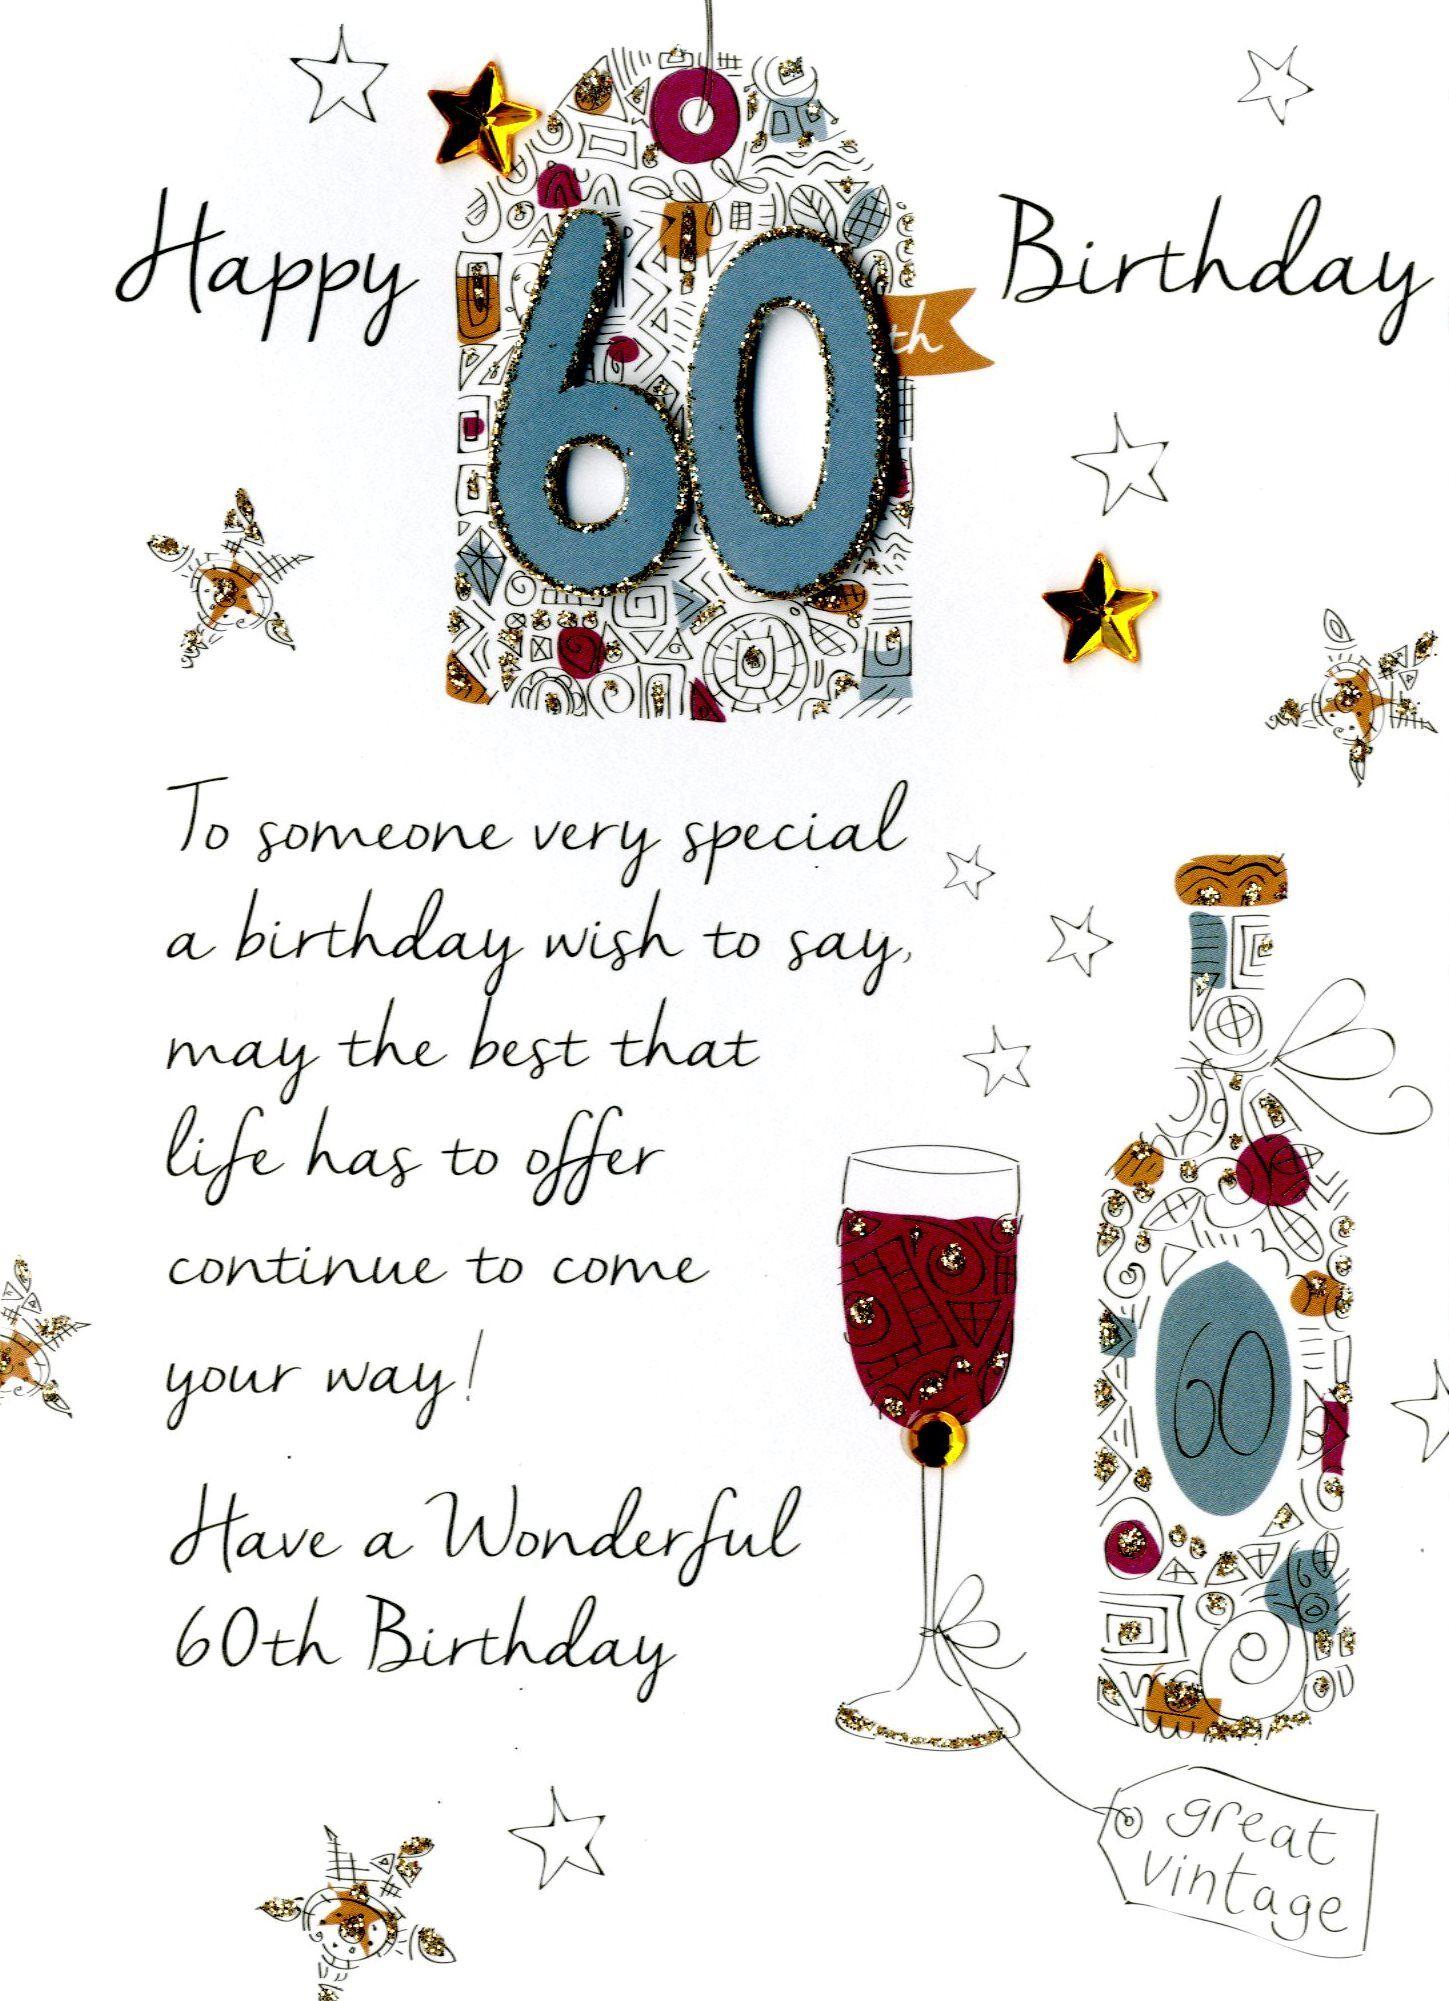 Pin By Bertha Urdang On Birthday 60th Birthday Greetings 60th Birthday Cards 60th Birthday Quotes